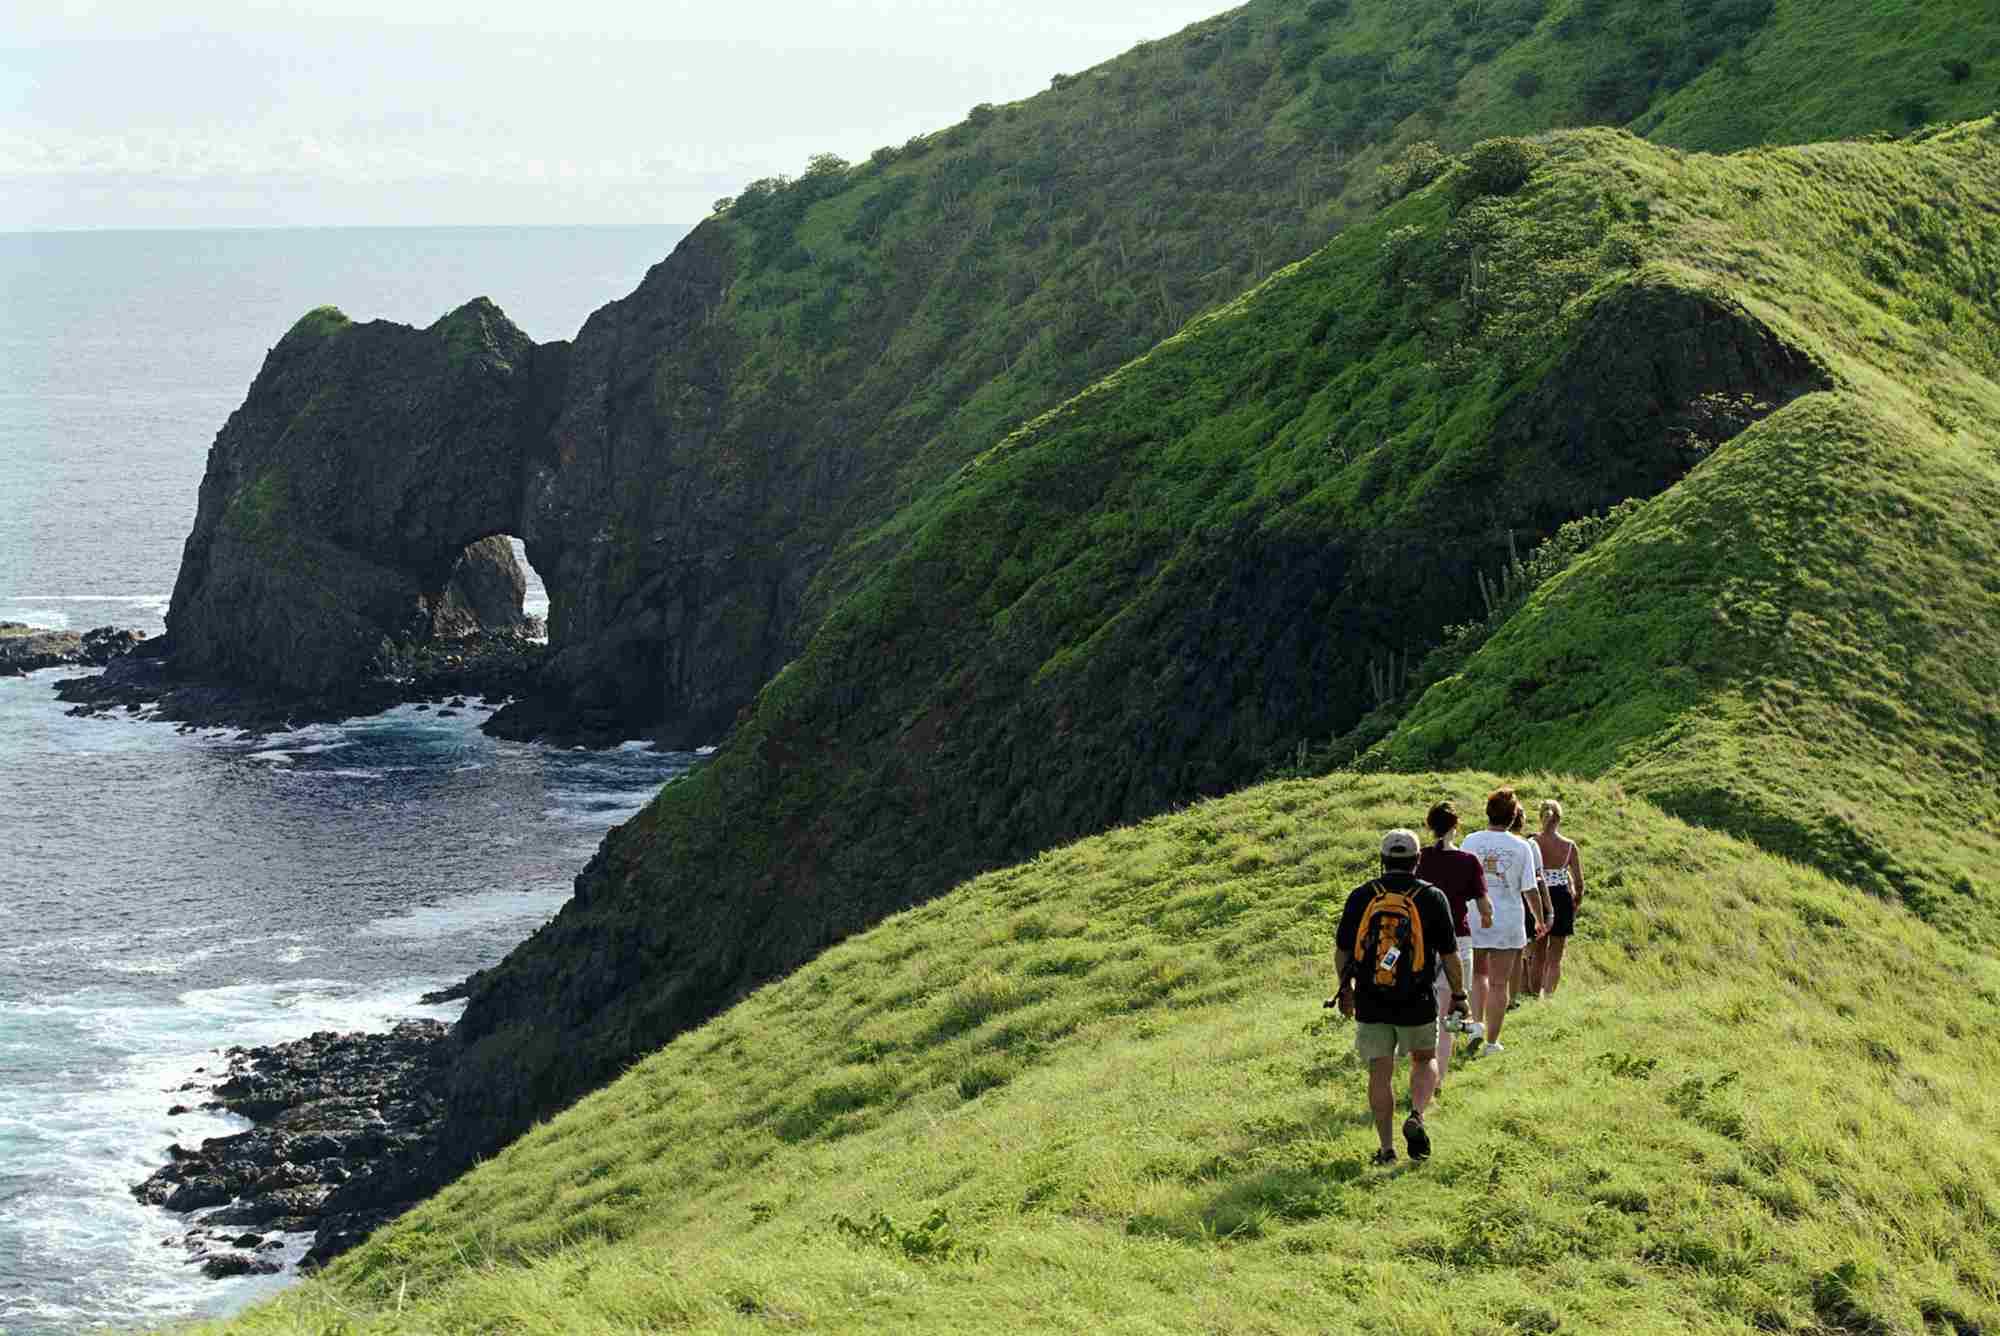 Costa Rica, Santa Rosa NP, Islas Murcielagos, tourists hiking